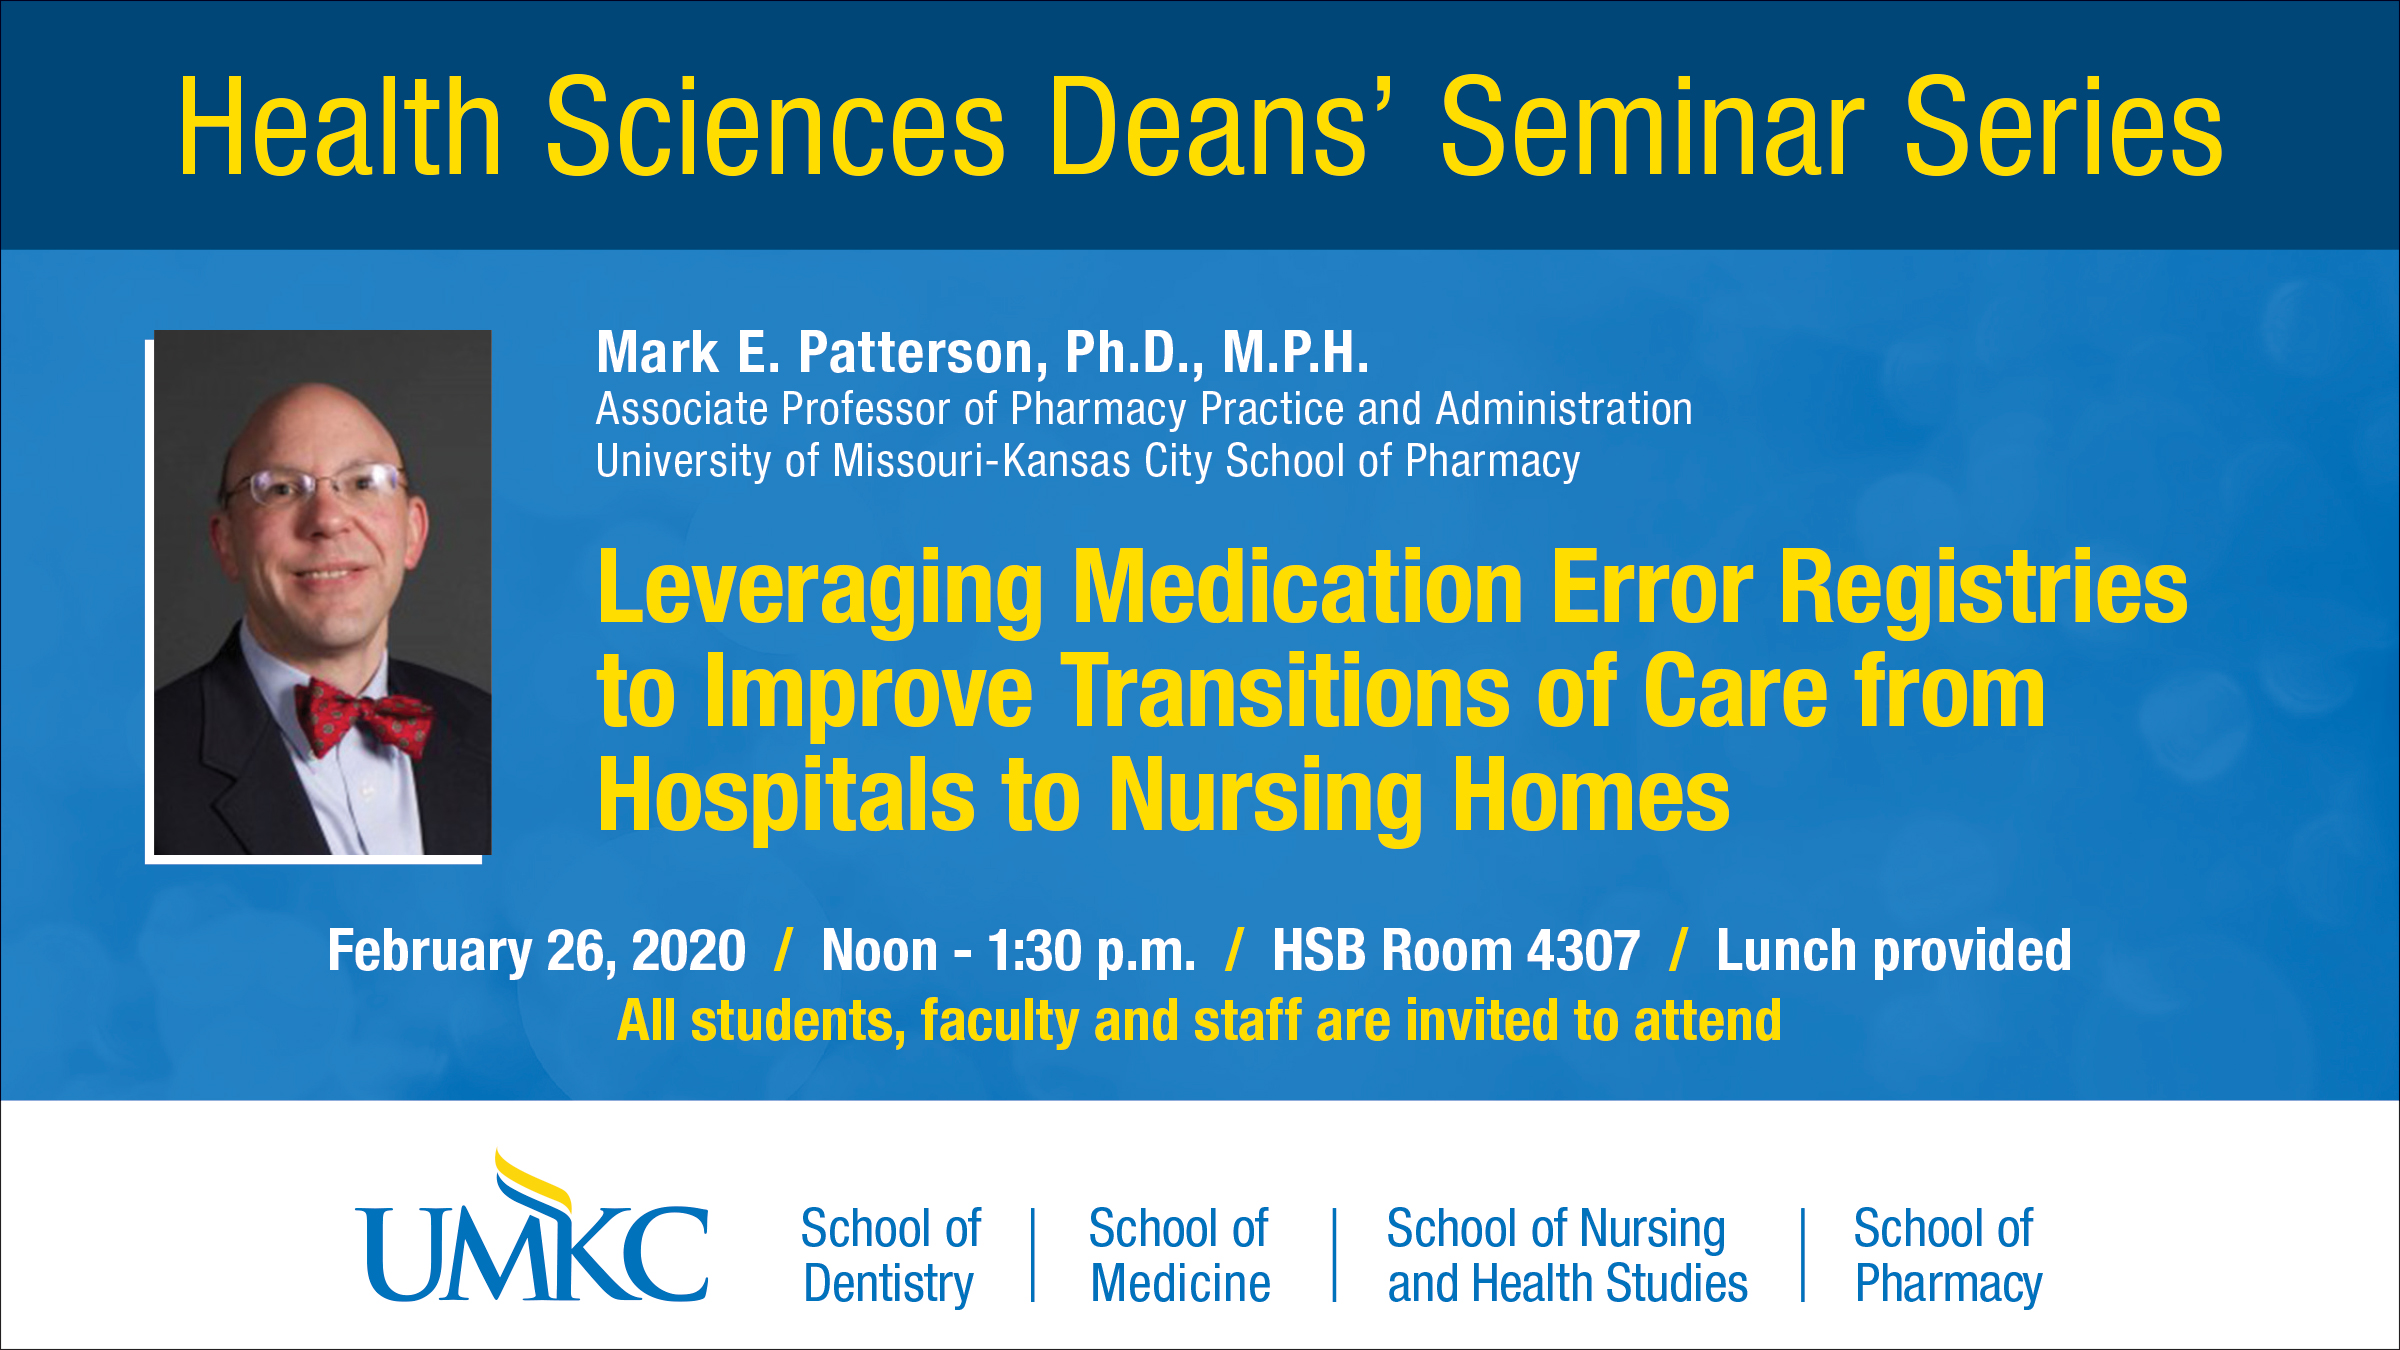 Health Sciences Deans' Seminar Series Banner Image